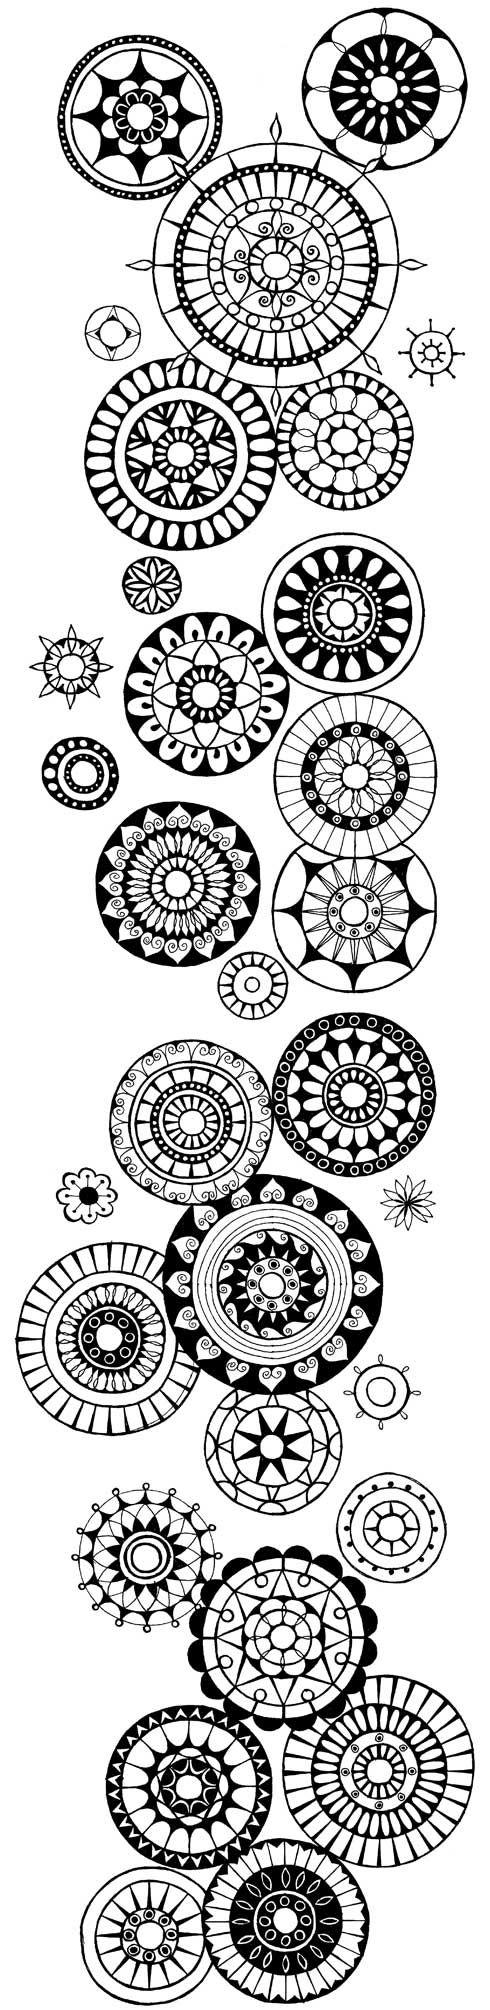 Zentangle Doodle Patterns Circle